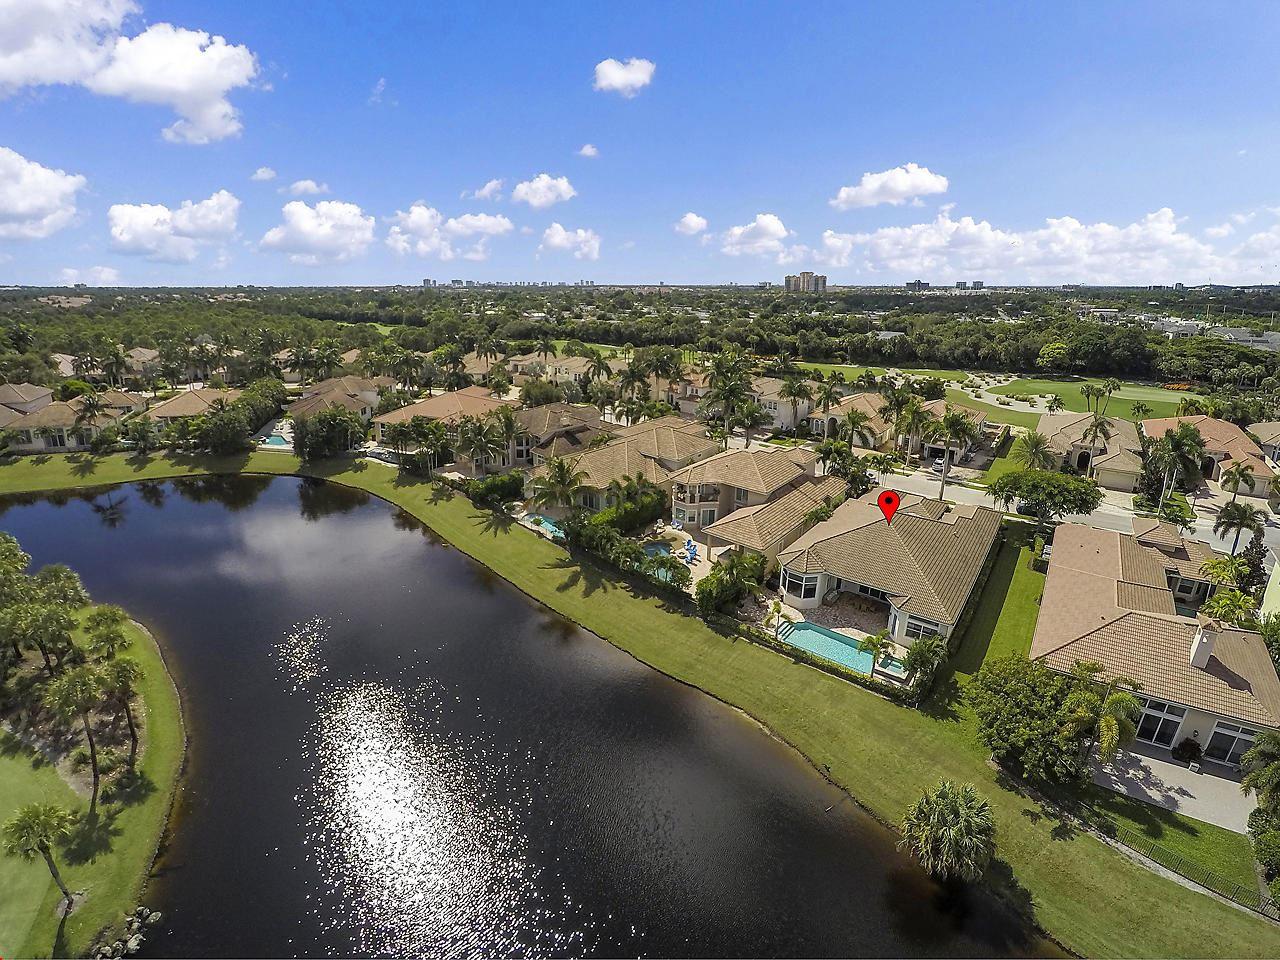 Photo of 733 Cote Azur Drive, Palm Beach Gardens, FL 33410 (MLS # RX-10654033)